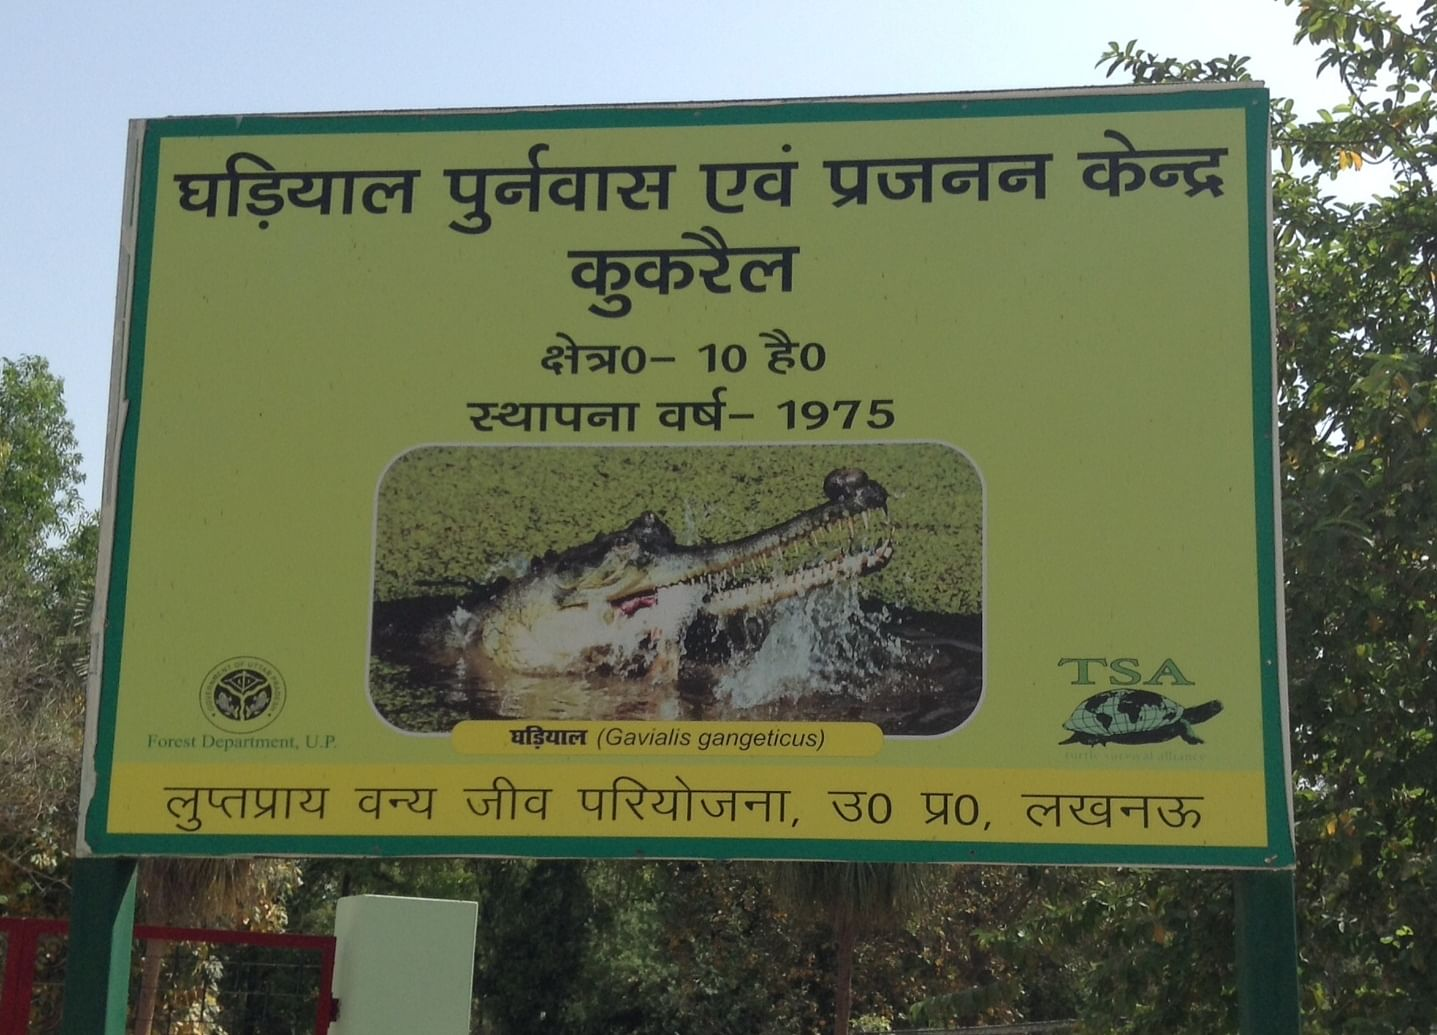 The Kukrail Gharial Rehabilitation Centre